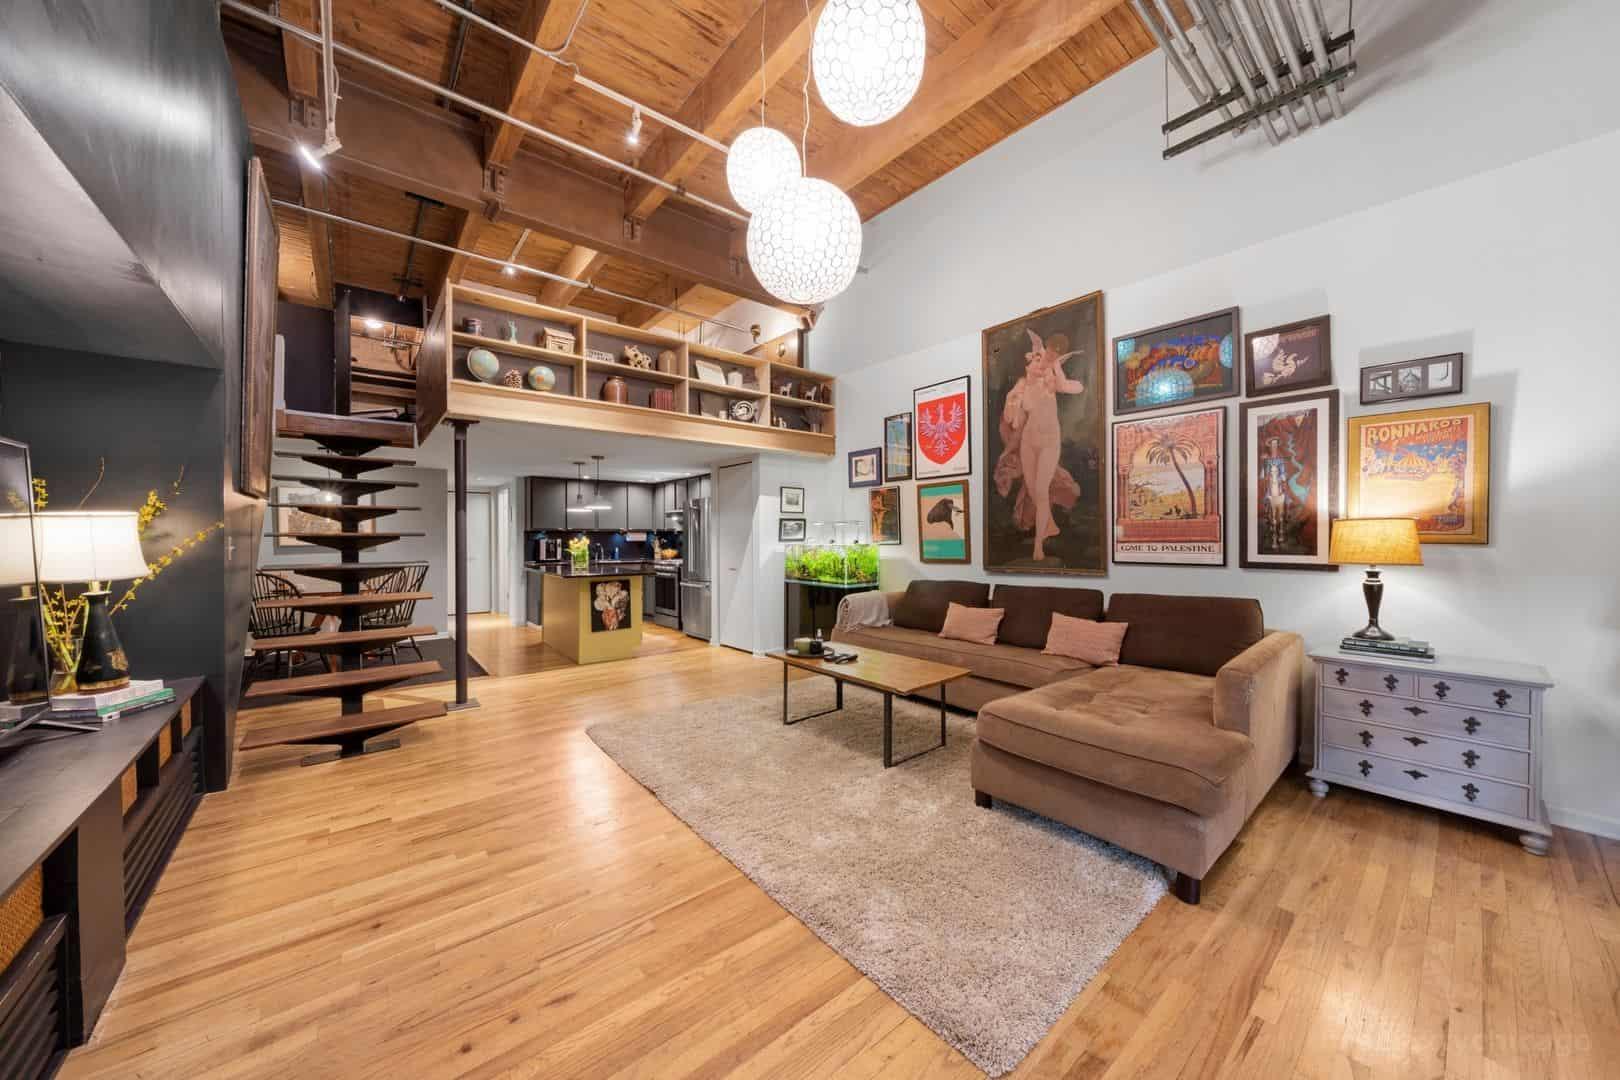 22 N Morgan Street, Unit 106, Chicago IL 60607 - Living Area 2